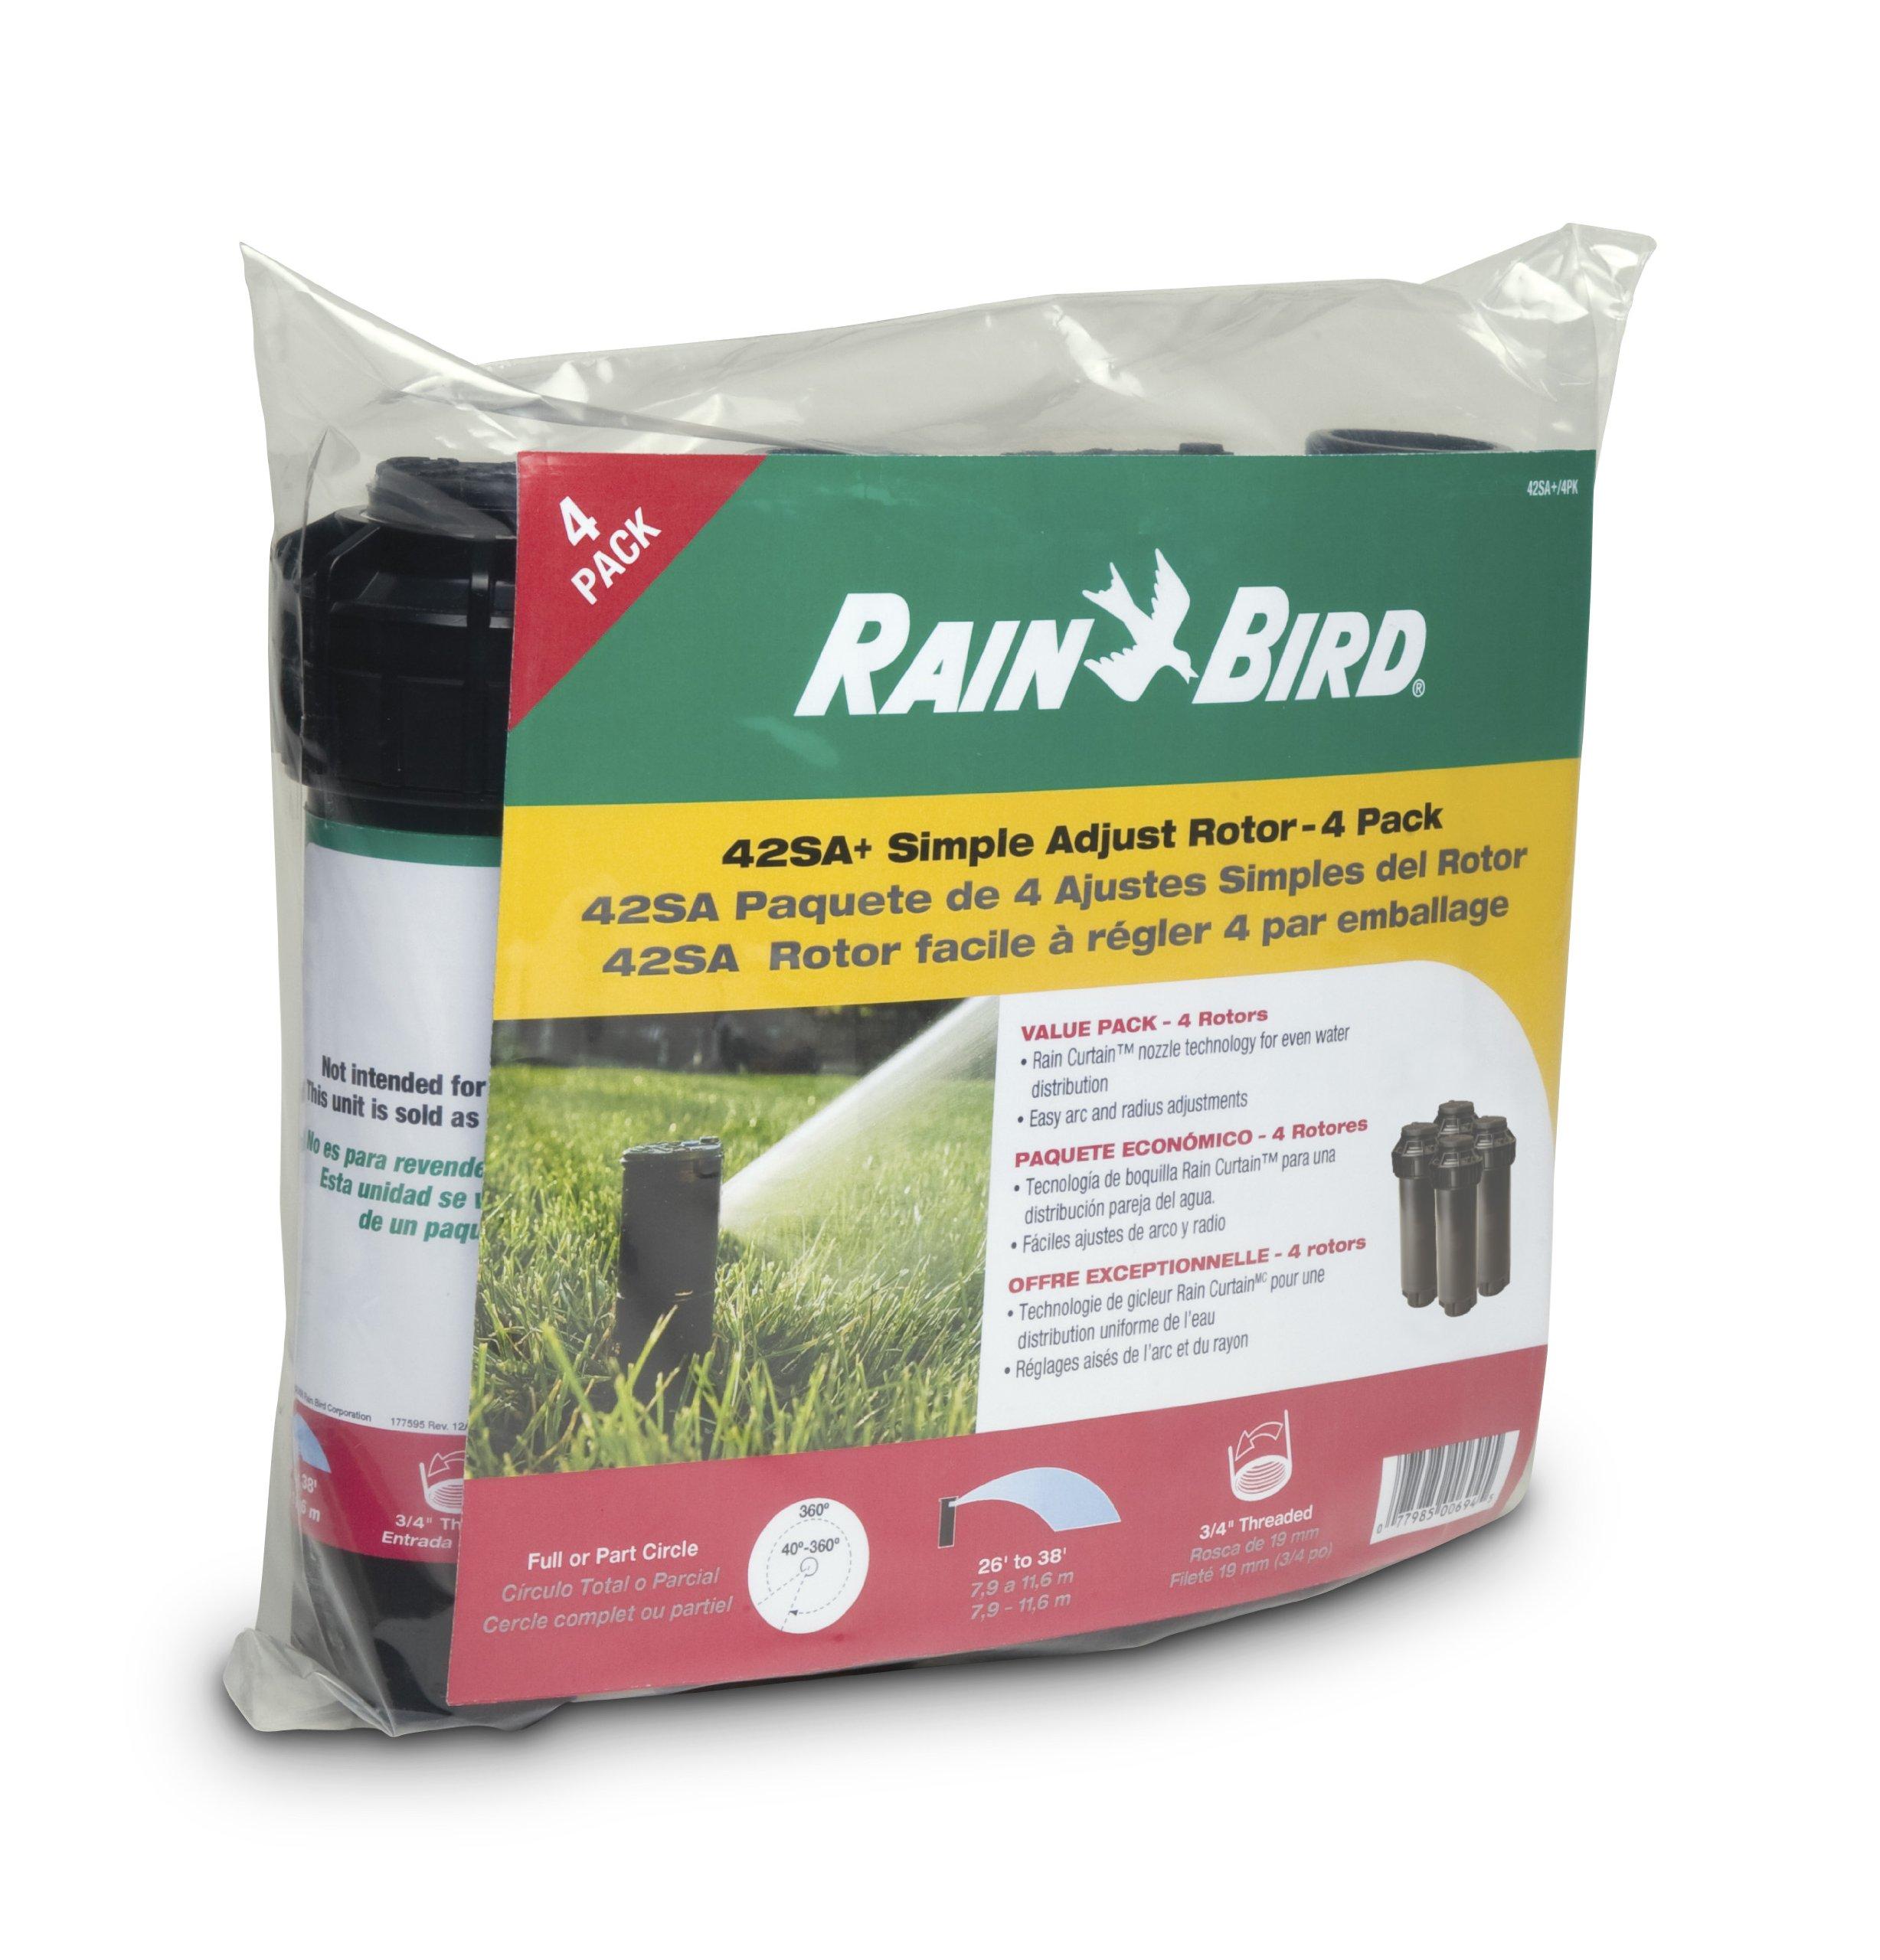 Rain Bird 42SA+/4PK Simple Adjust Gear Drive Rotor, Adjustable 40° - 360° Pattern, 26' - 38' Spray Distance, 4-Pack by Rain Bird